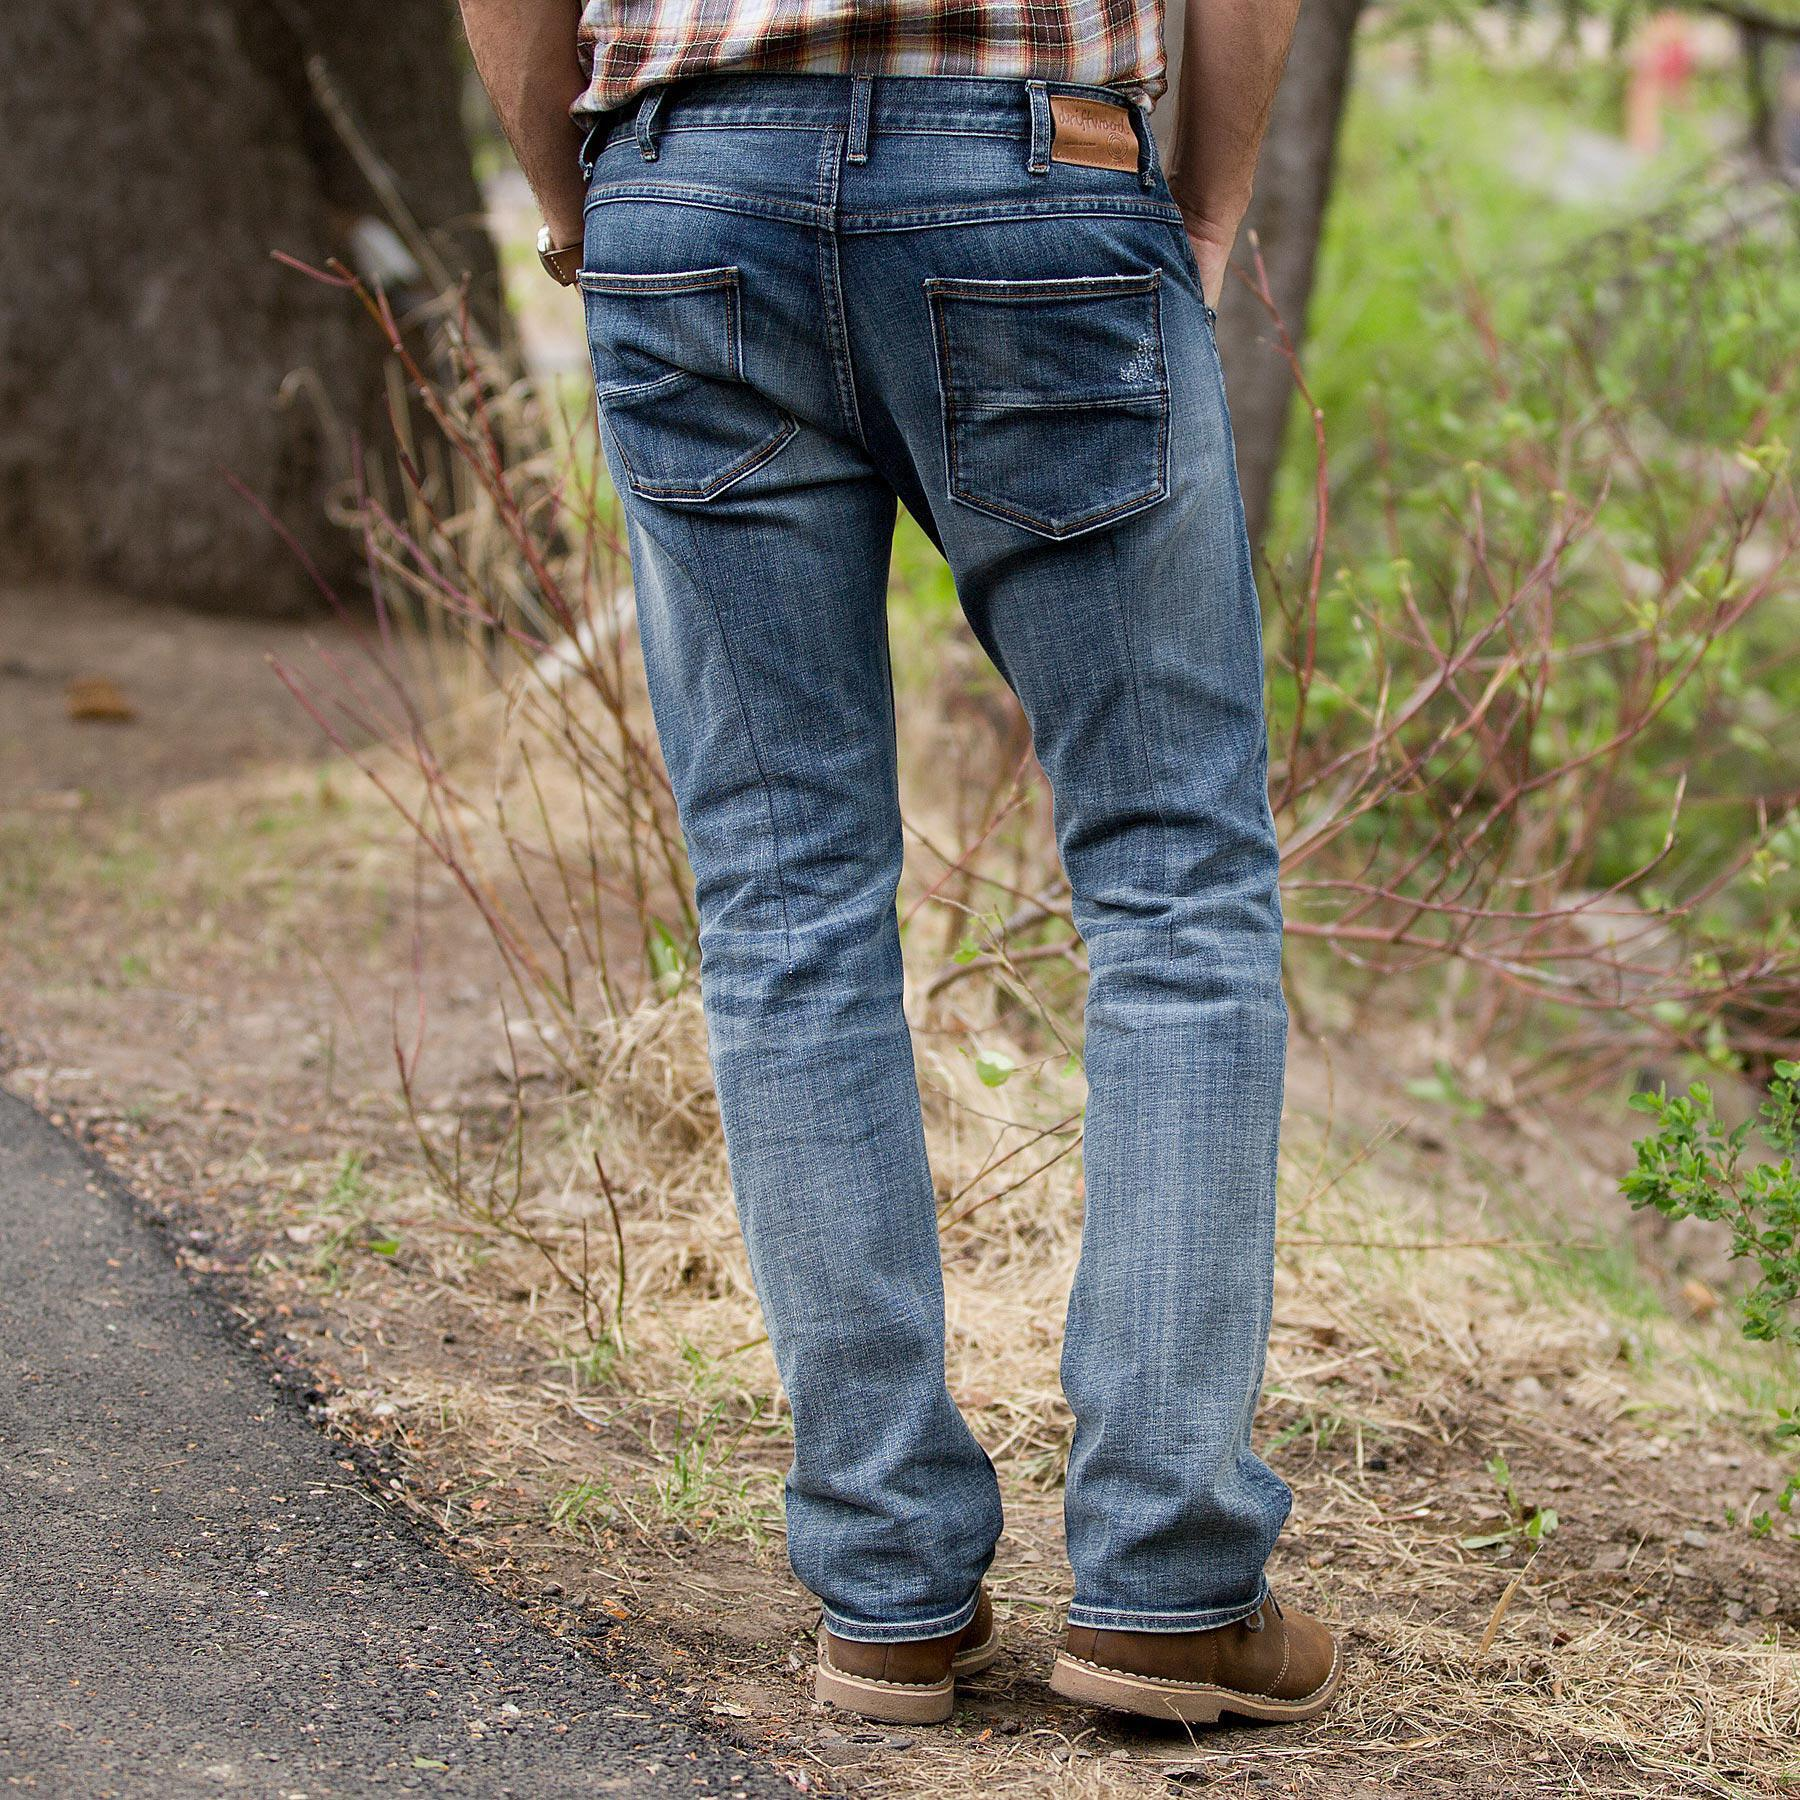 Crusader Jeans: View 2